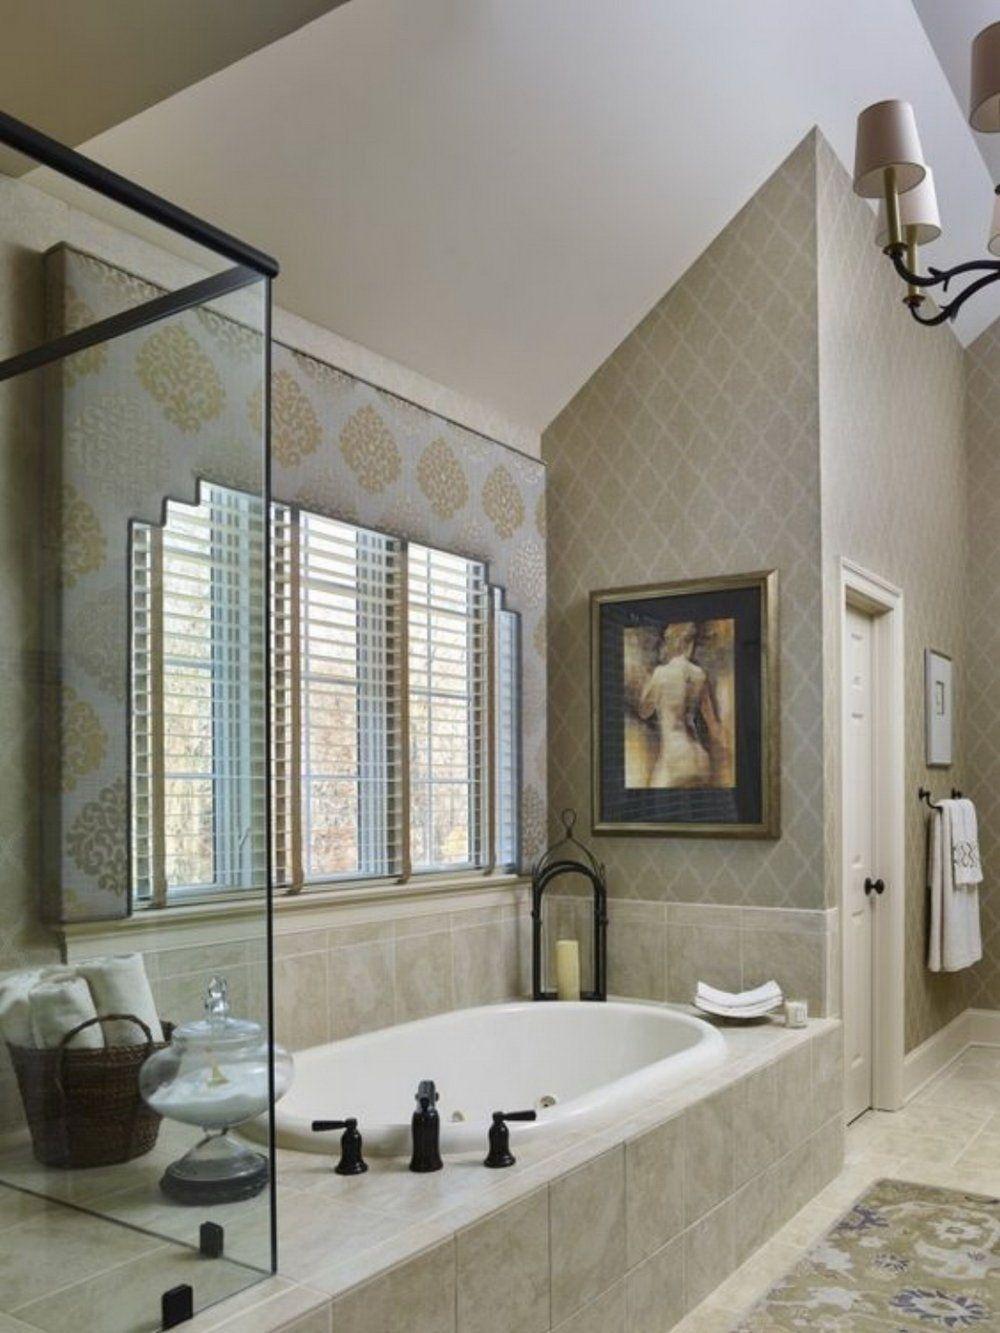 Master bedroom without bathroom   Trending Luxury MasterBathroom Designs   Master bathrooms